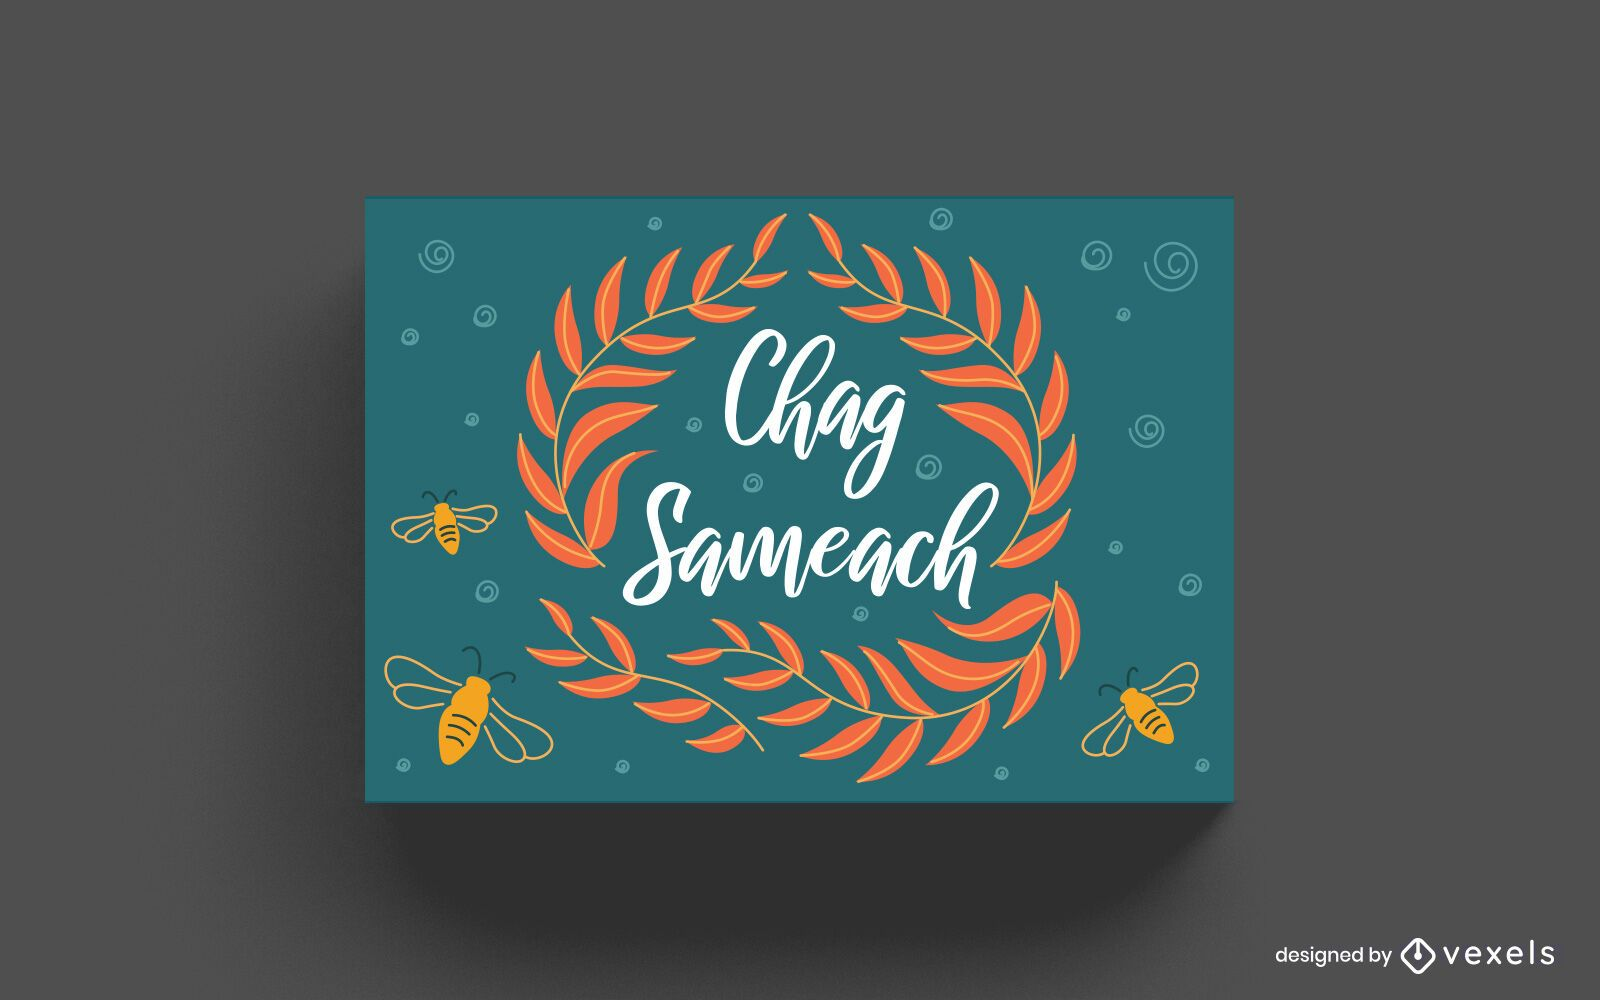 Diseño de tarjeta de letras Chag Sameach